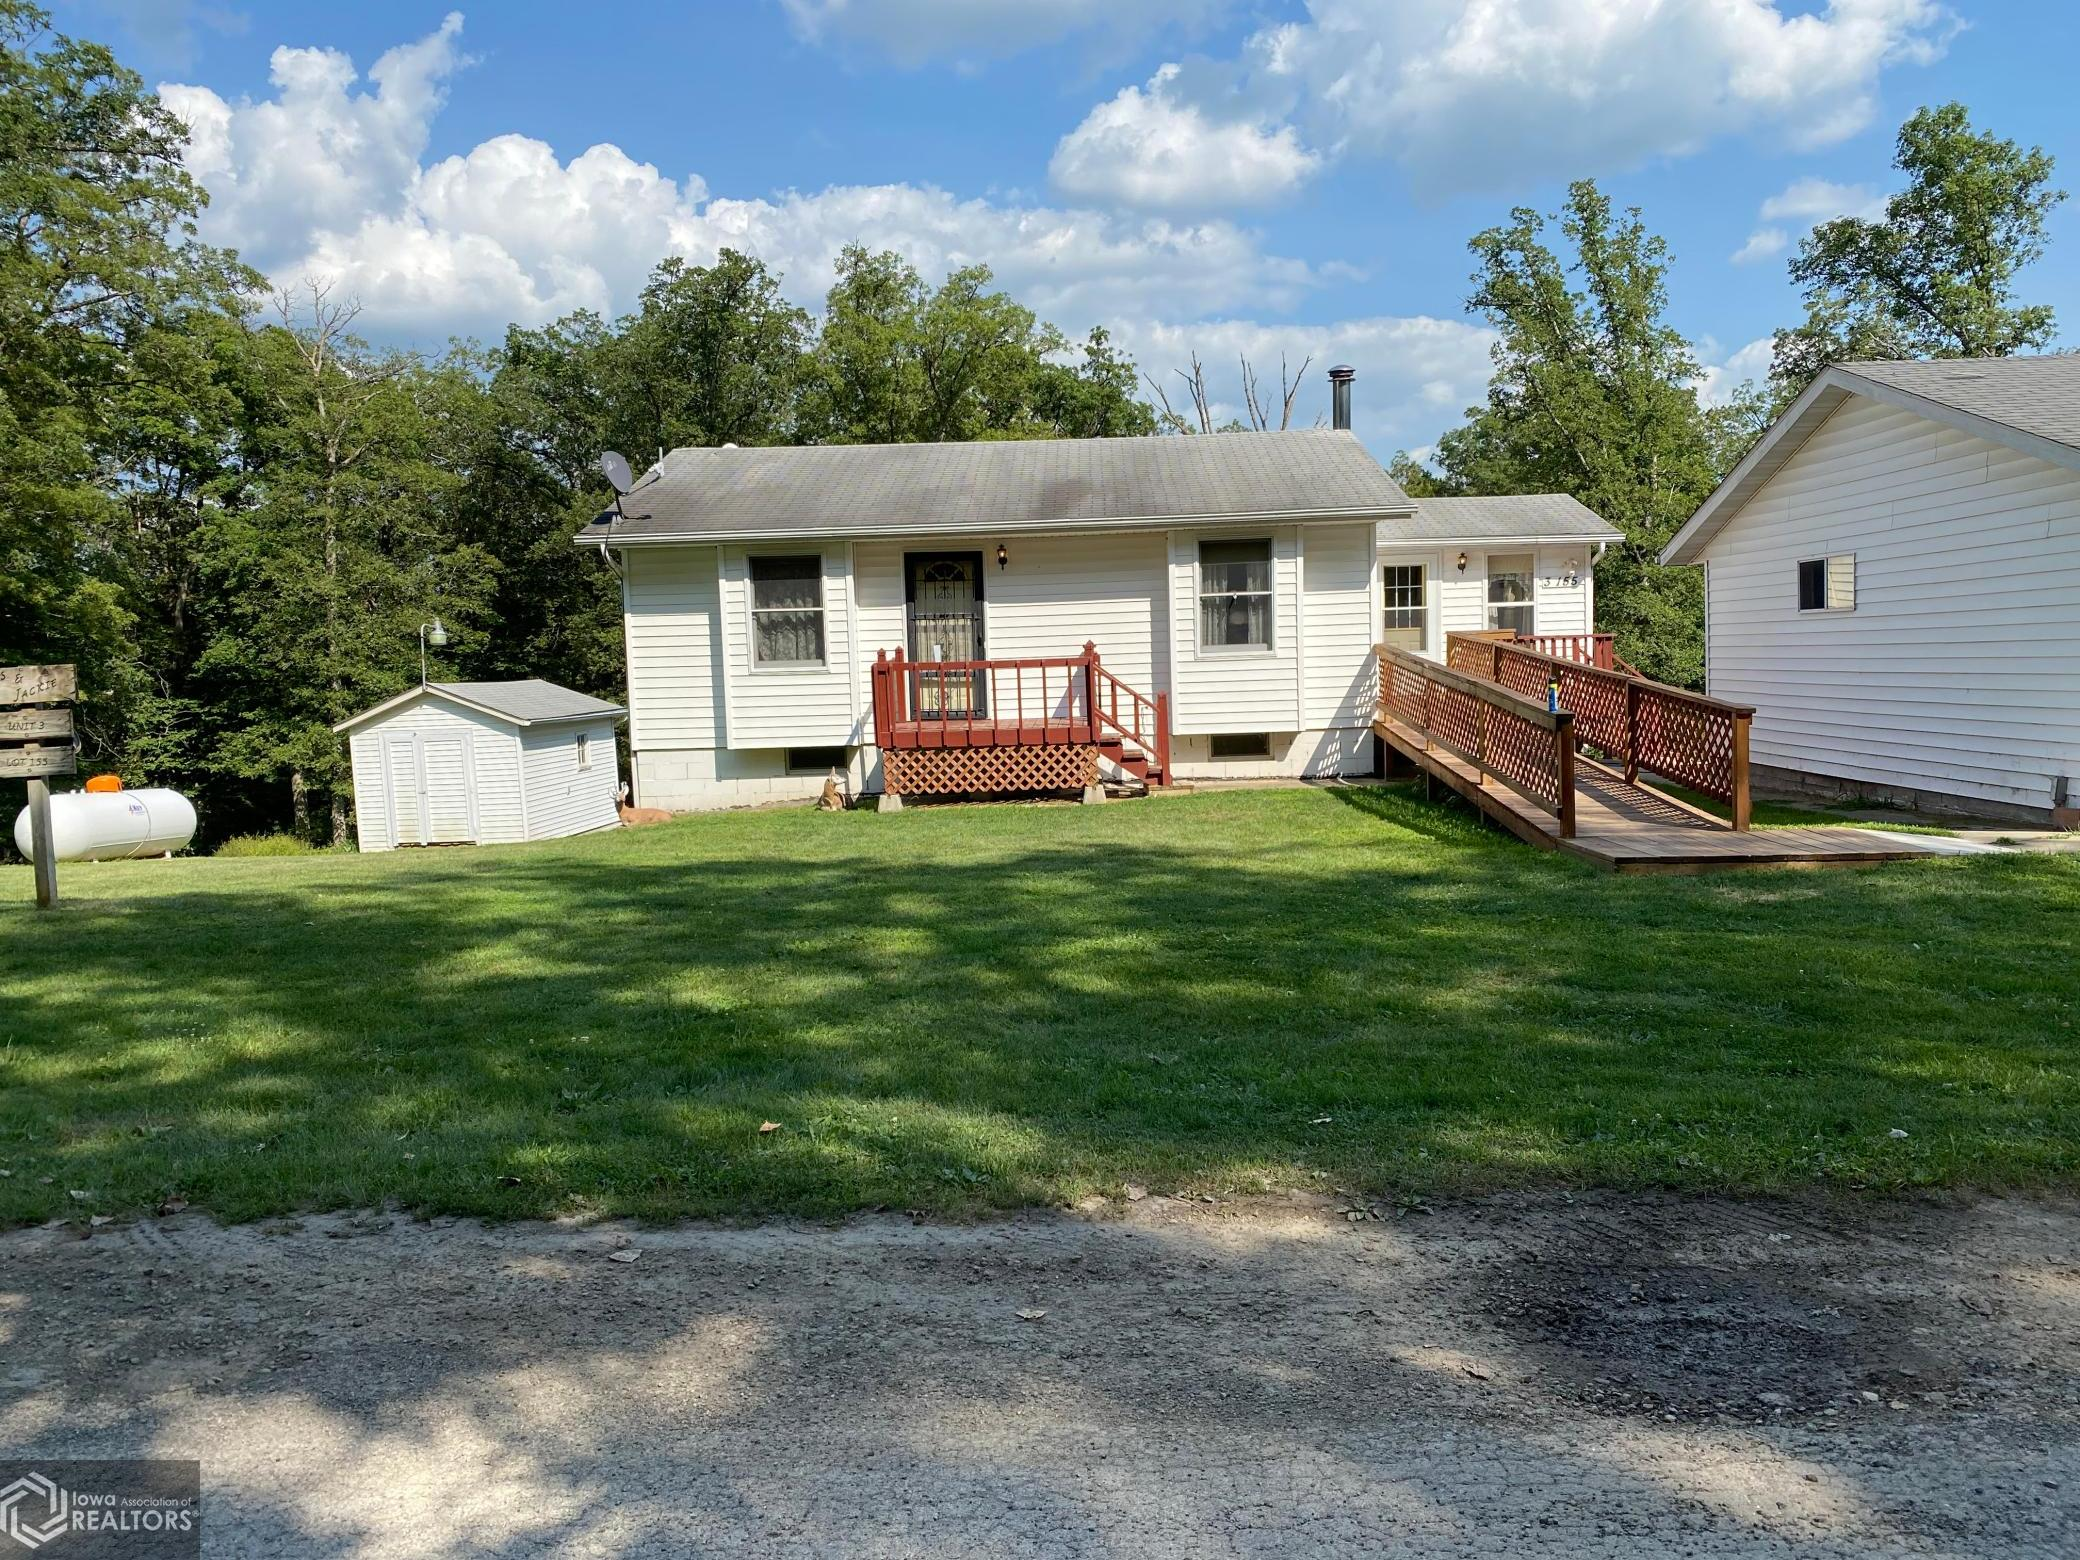 3155 Joan, Brooklyn, Iowa 52211-9508, 3 Bedrooms Bedrooms, ,1 BathroomBathrooms,Single Family,For Sale,Joan,6080665